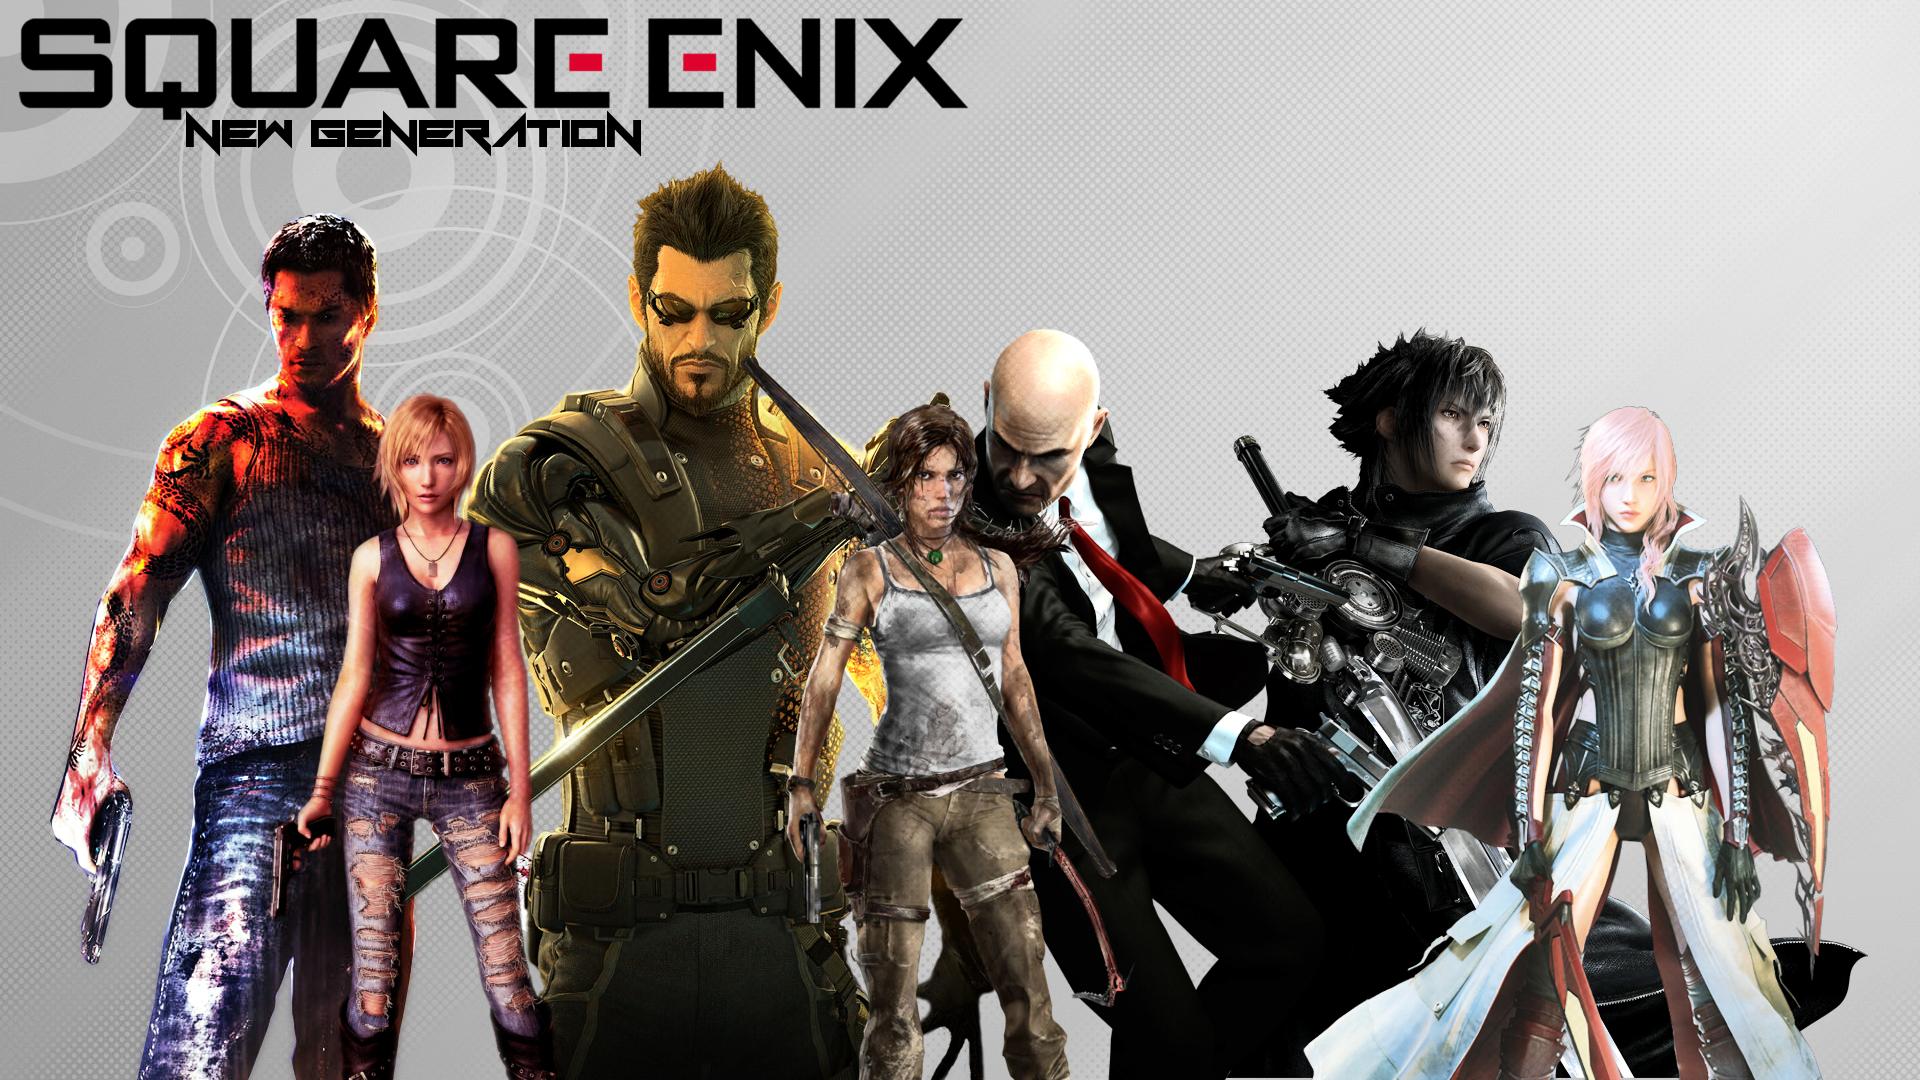 Square Enix anuncia Kingdom Hearts y Lara Croft para Android (E3 2015) 1